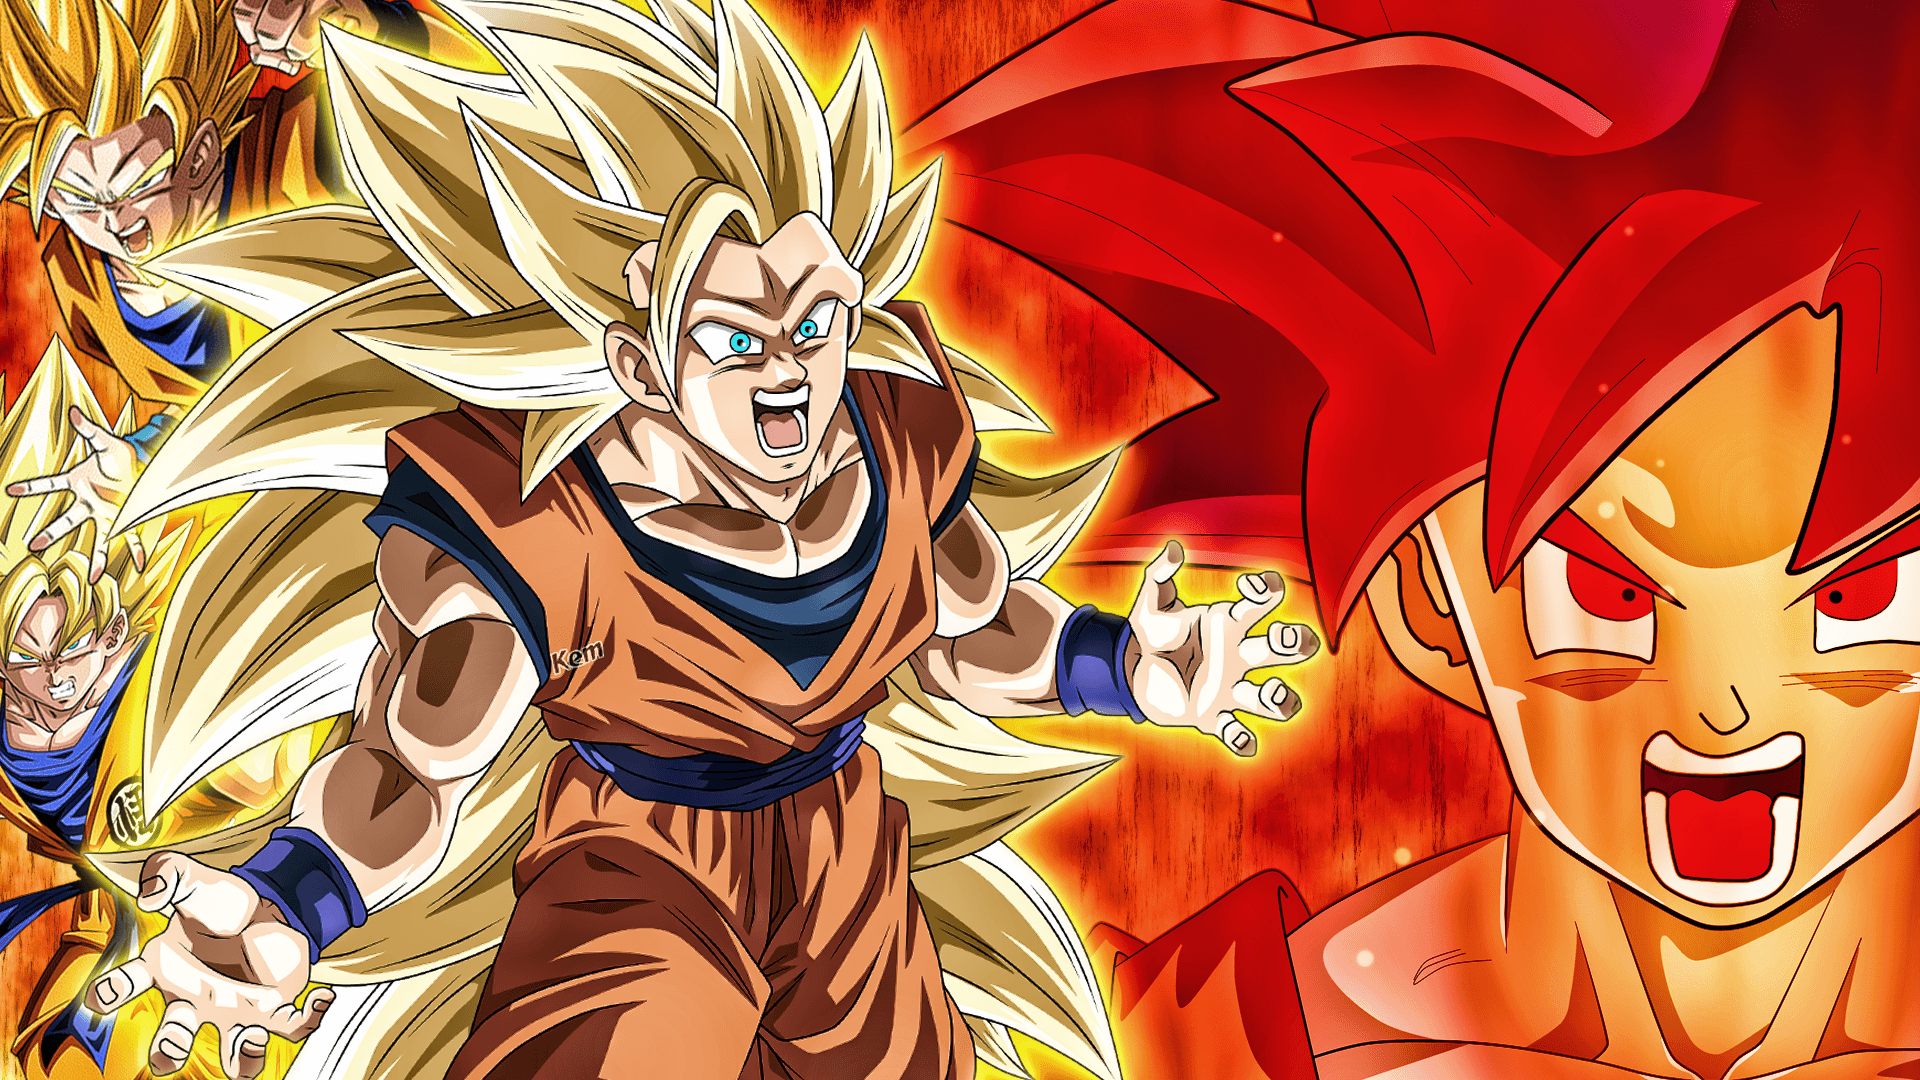 Dragon Ball Z wallpaper containing anime called ssj3 Goku